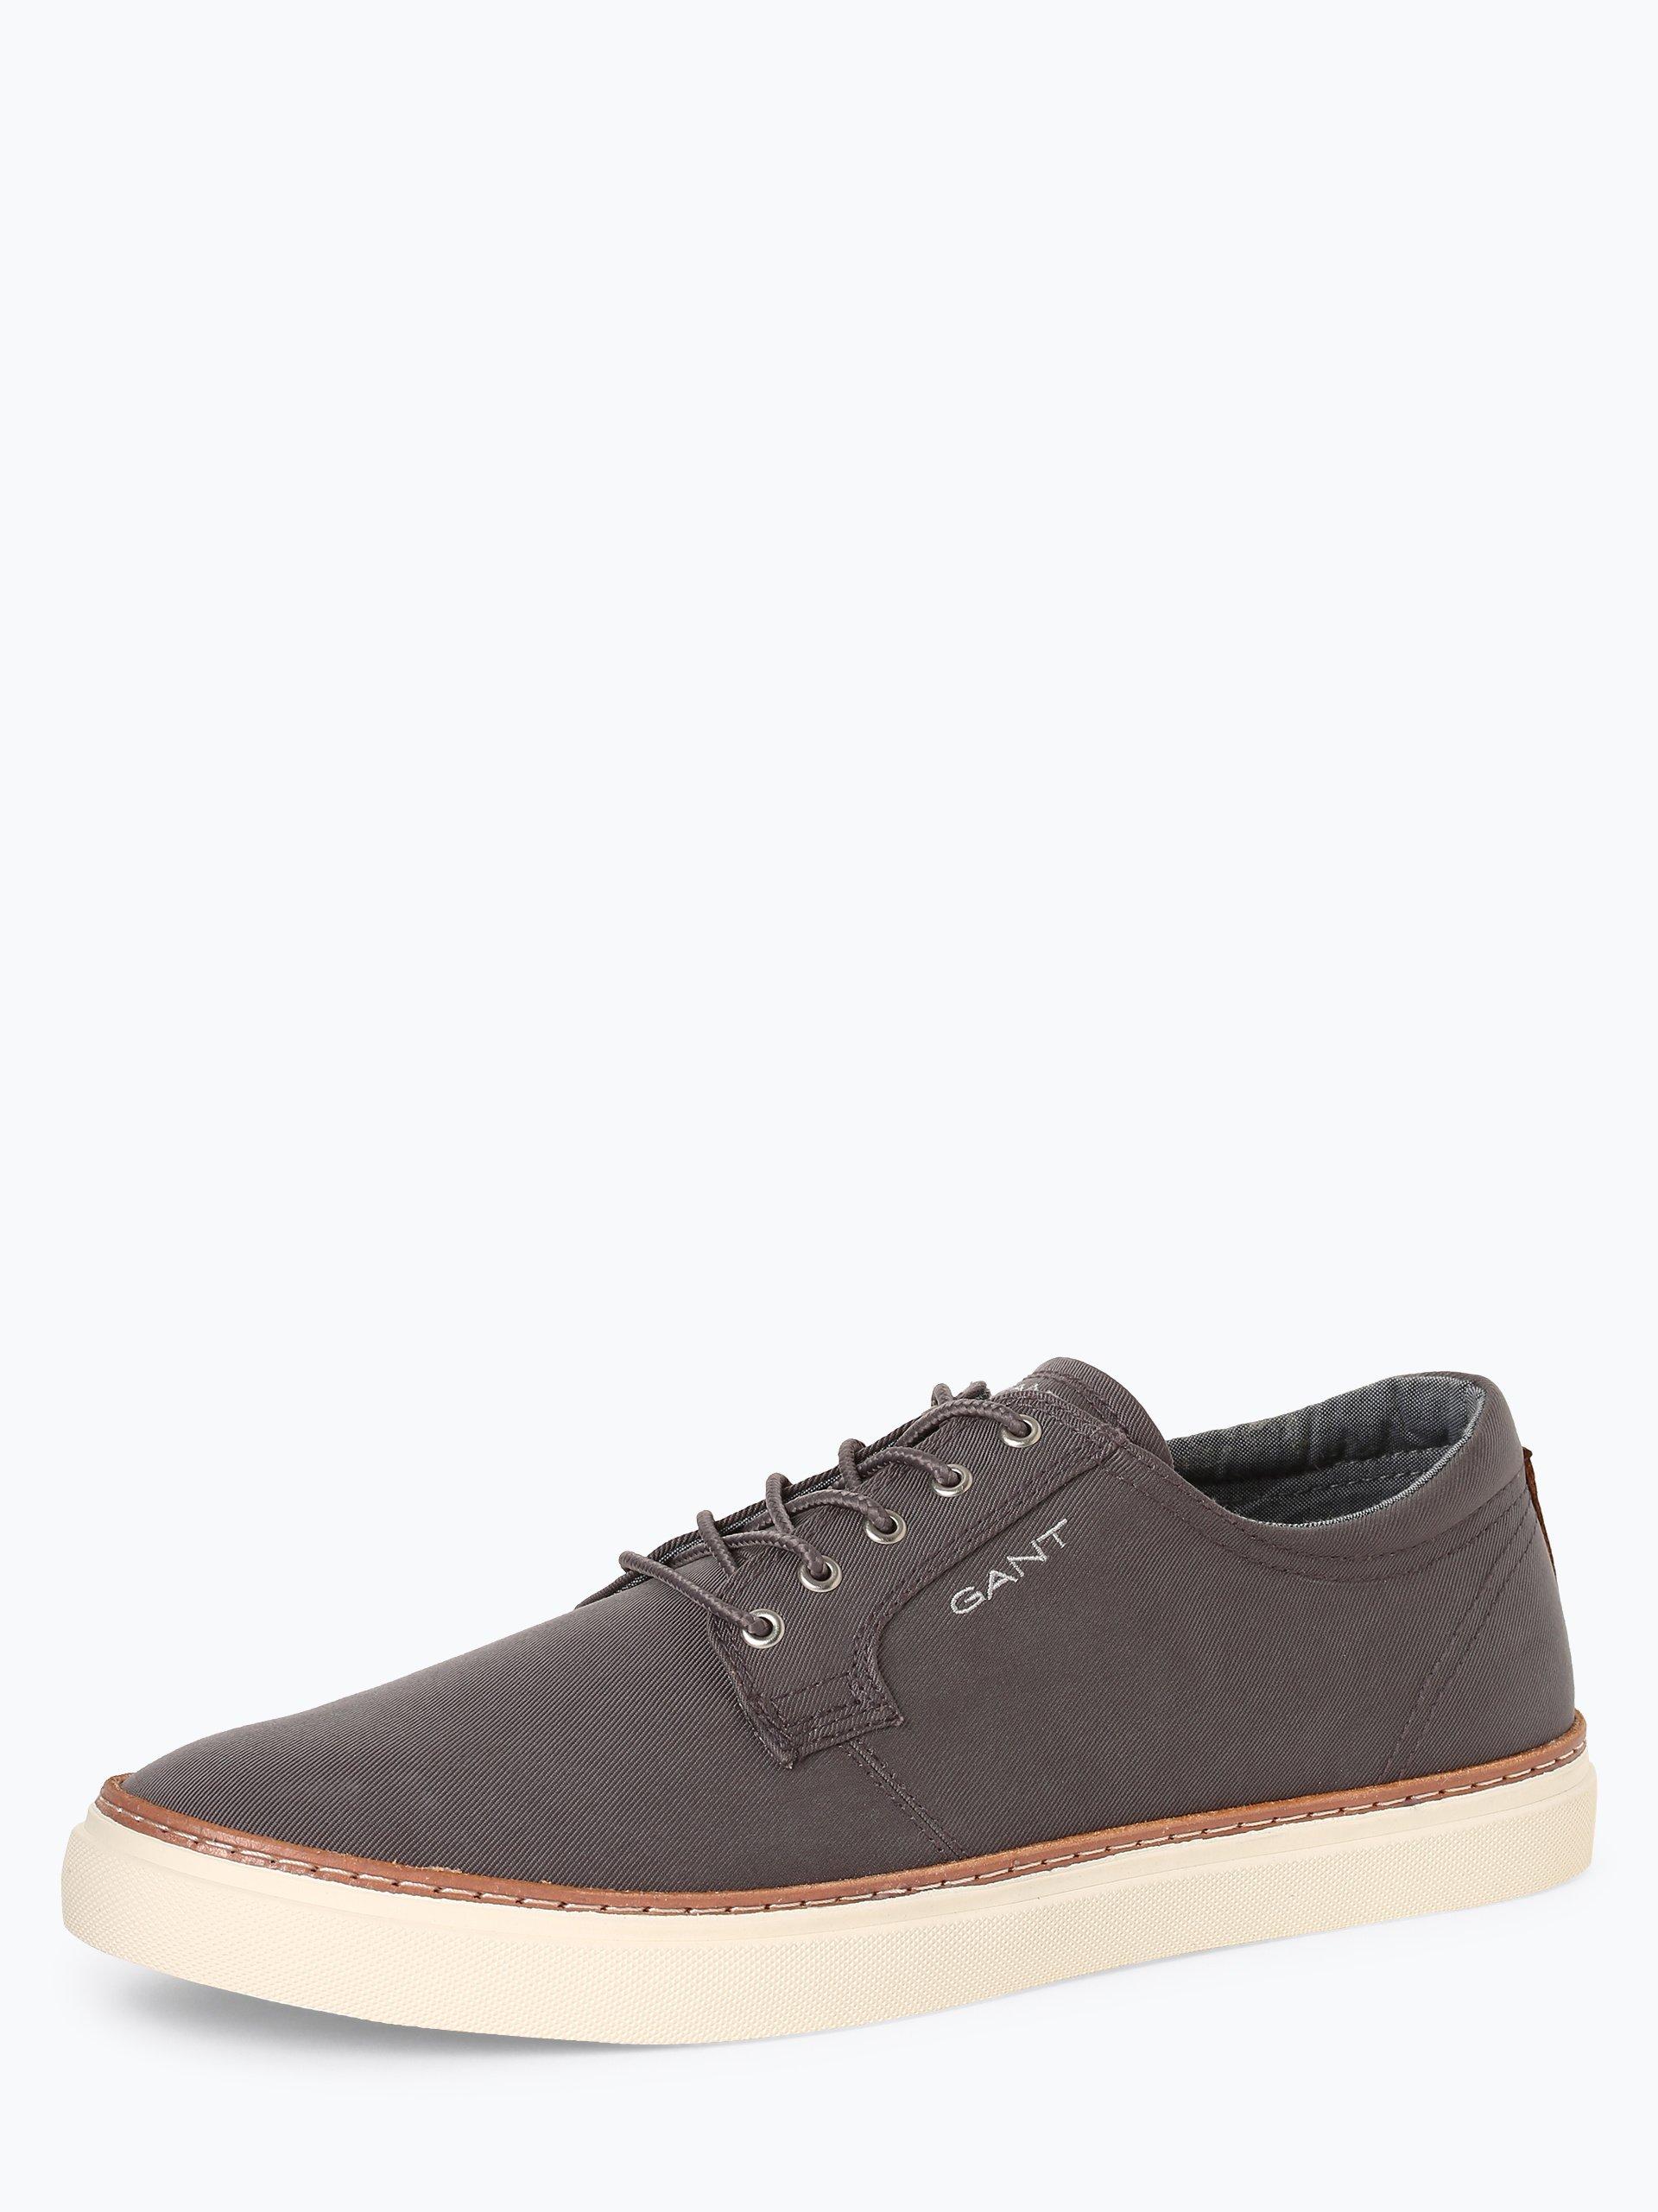 Gant Herren Sneaker mit Leder-Anteil